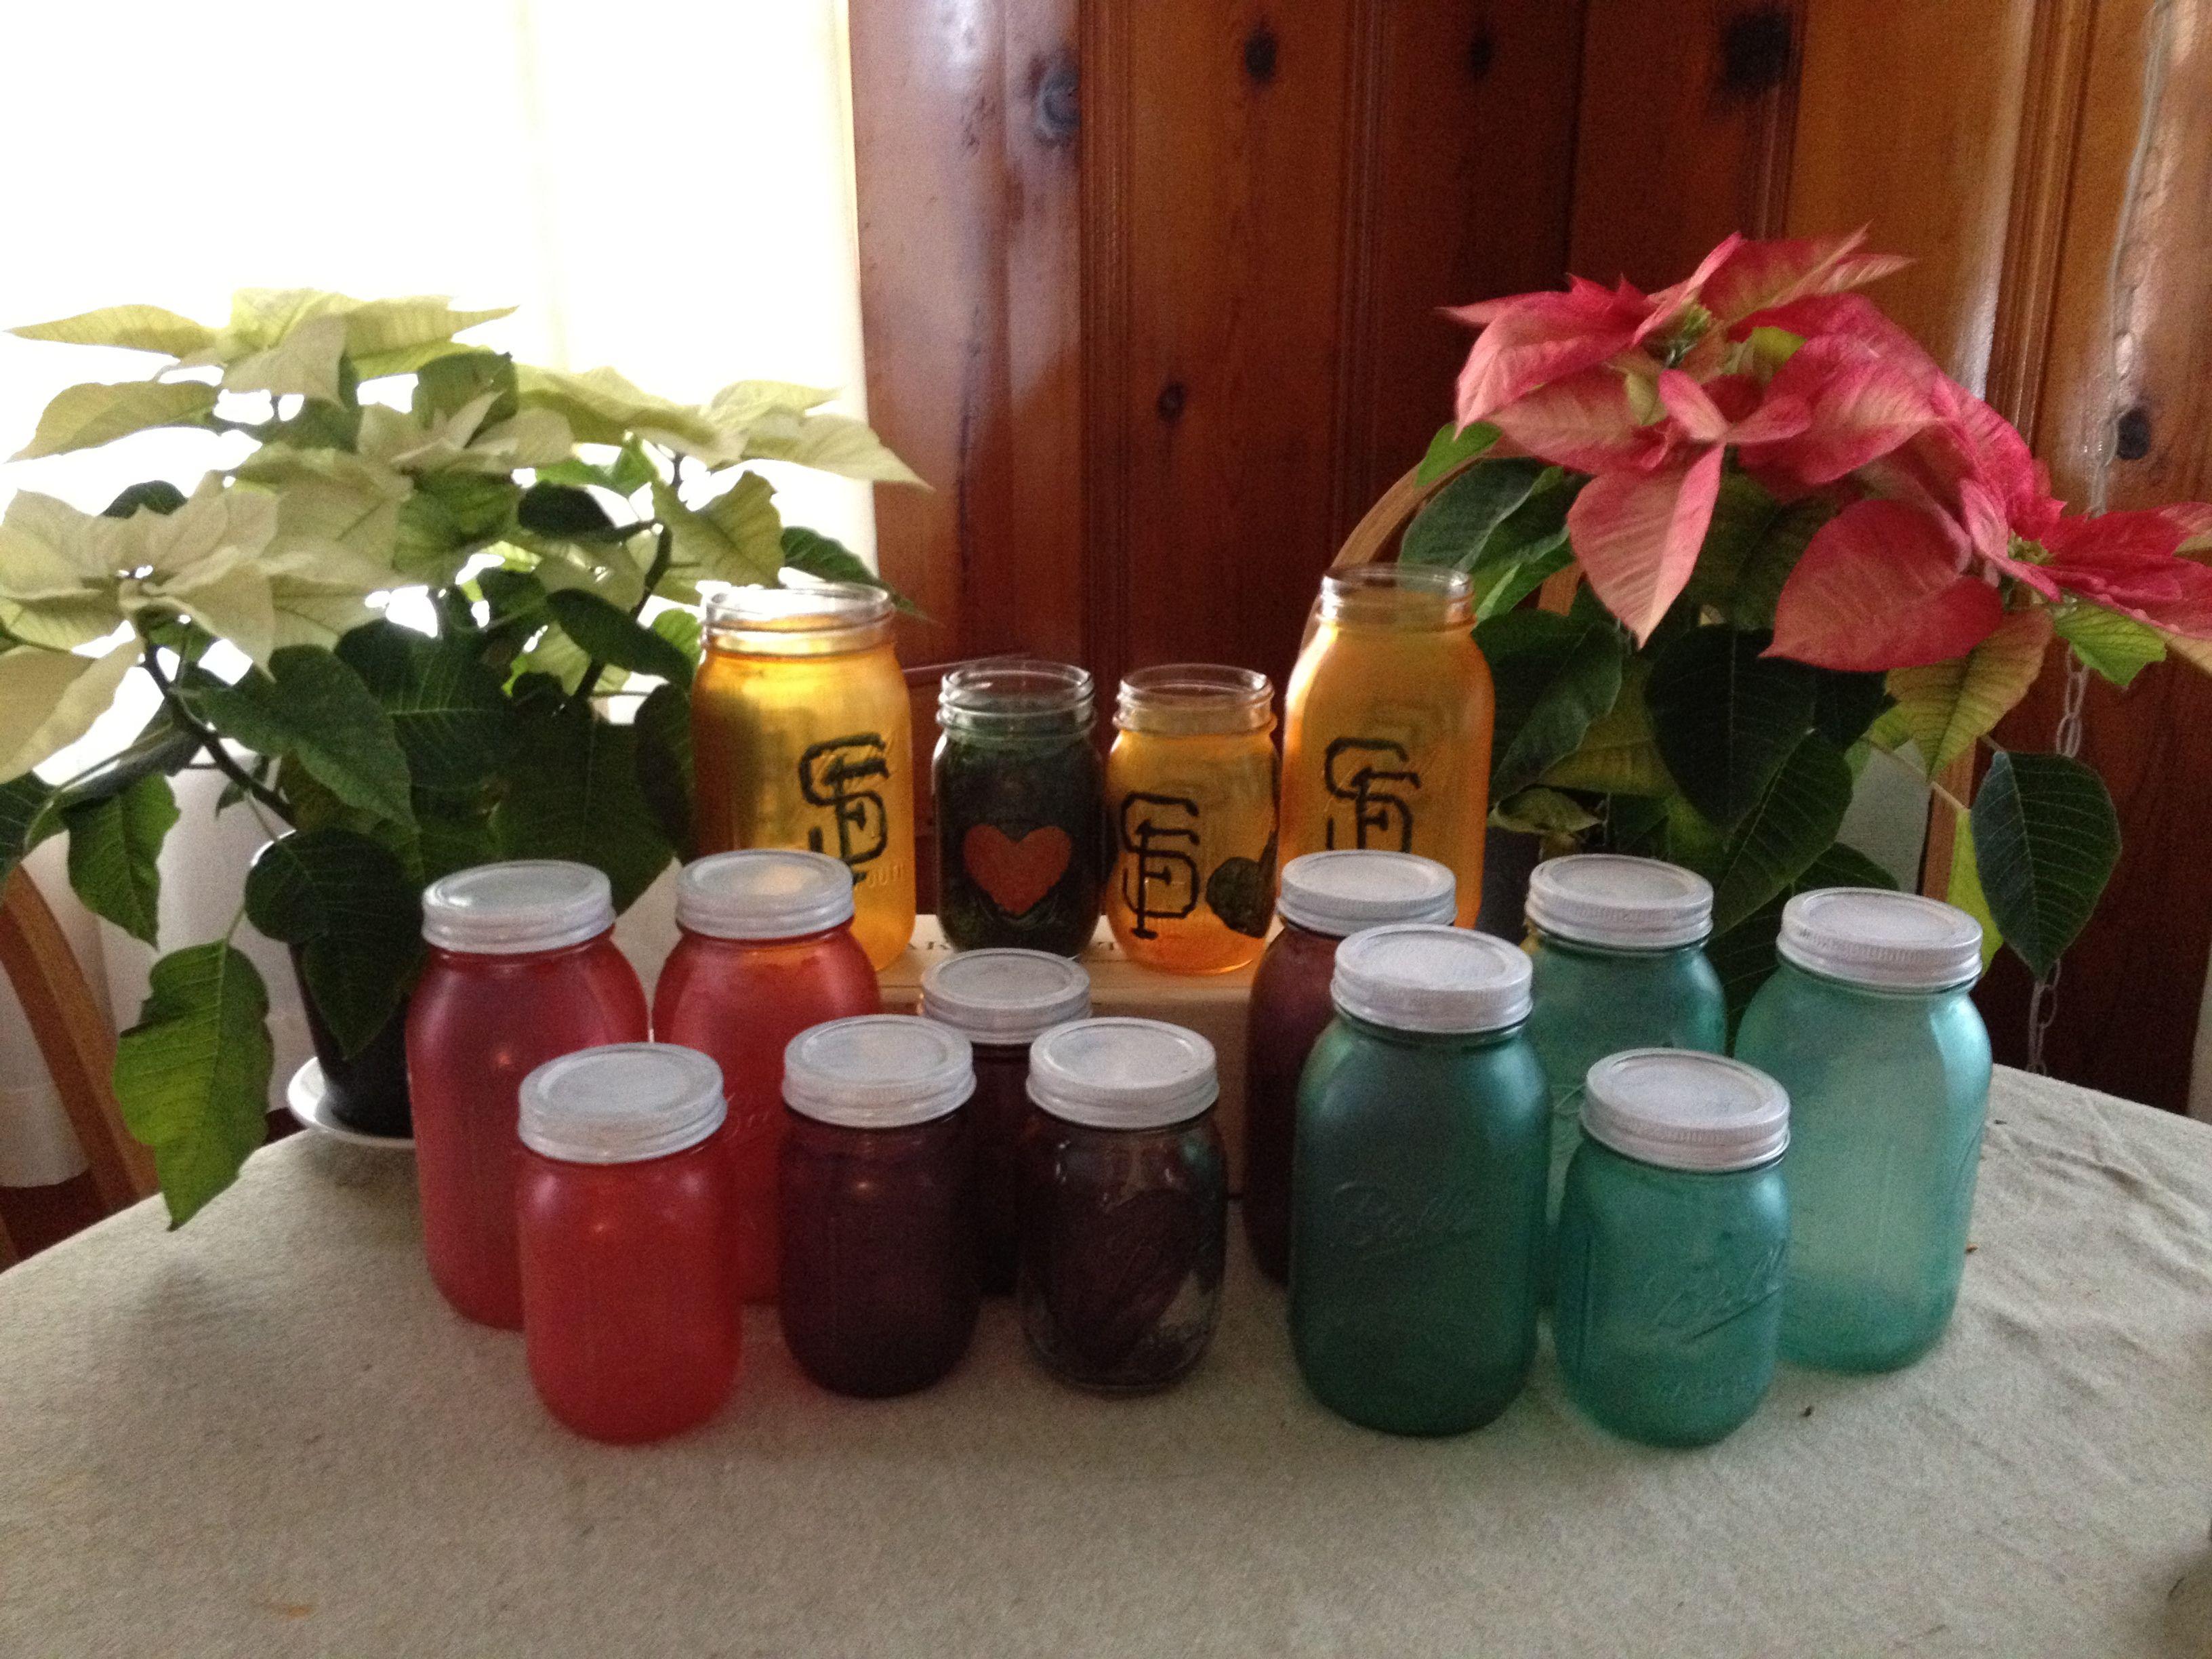 Food Coloring And Elmers Glue Painted On Mason Jars I